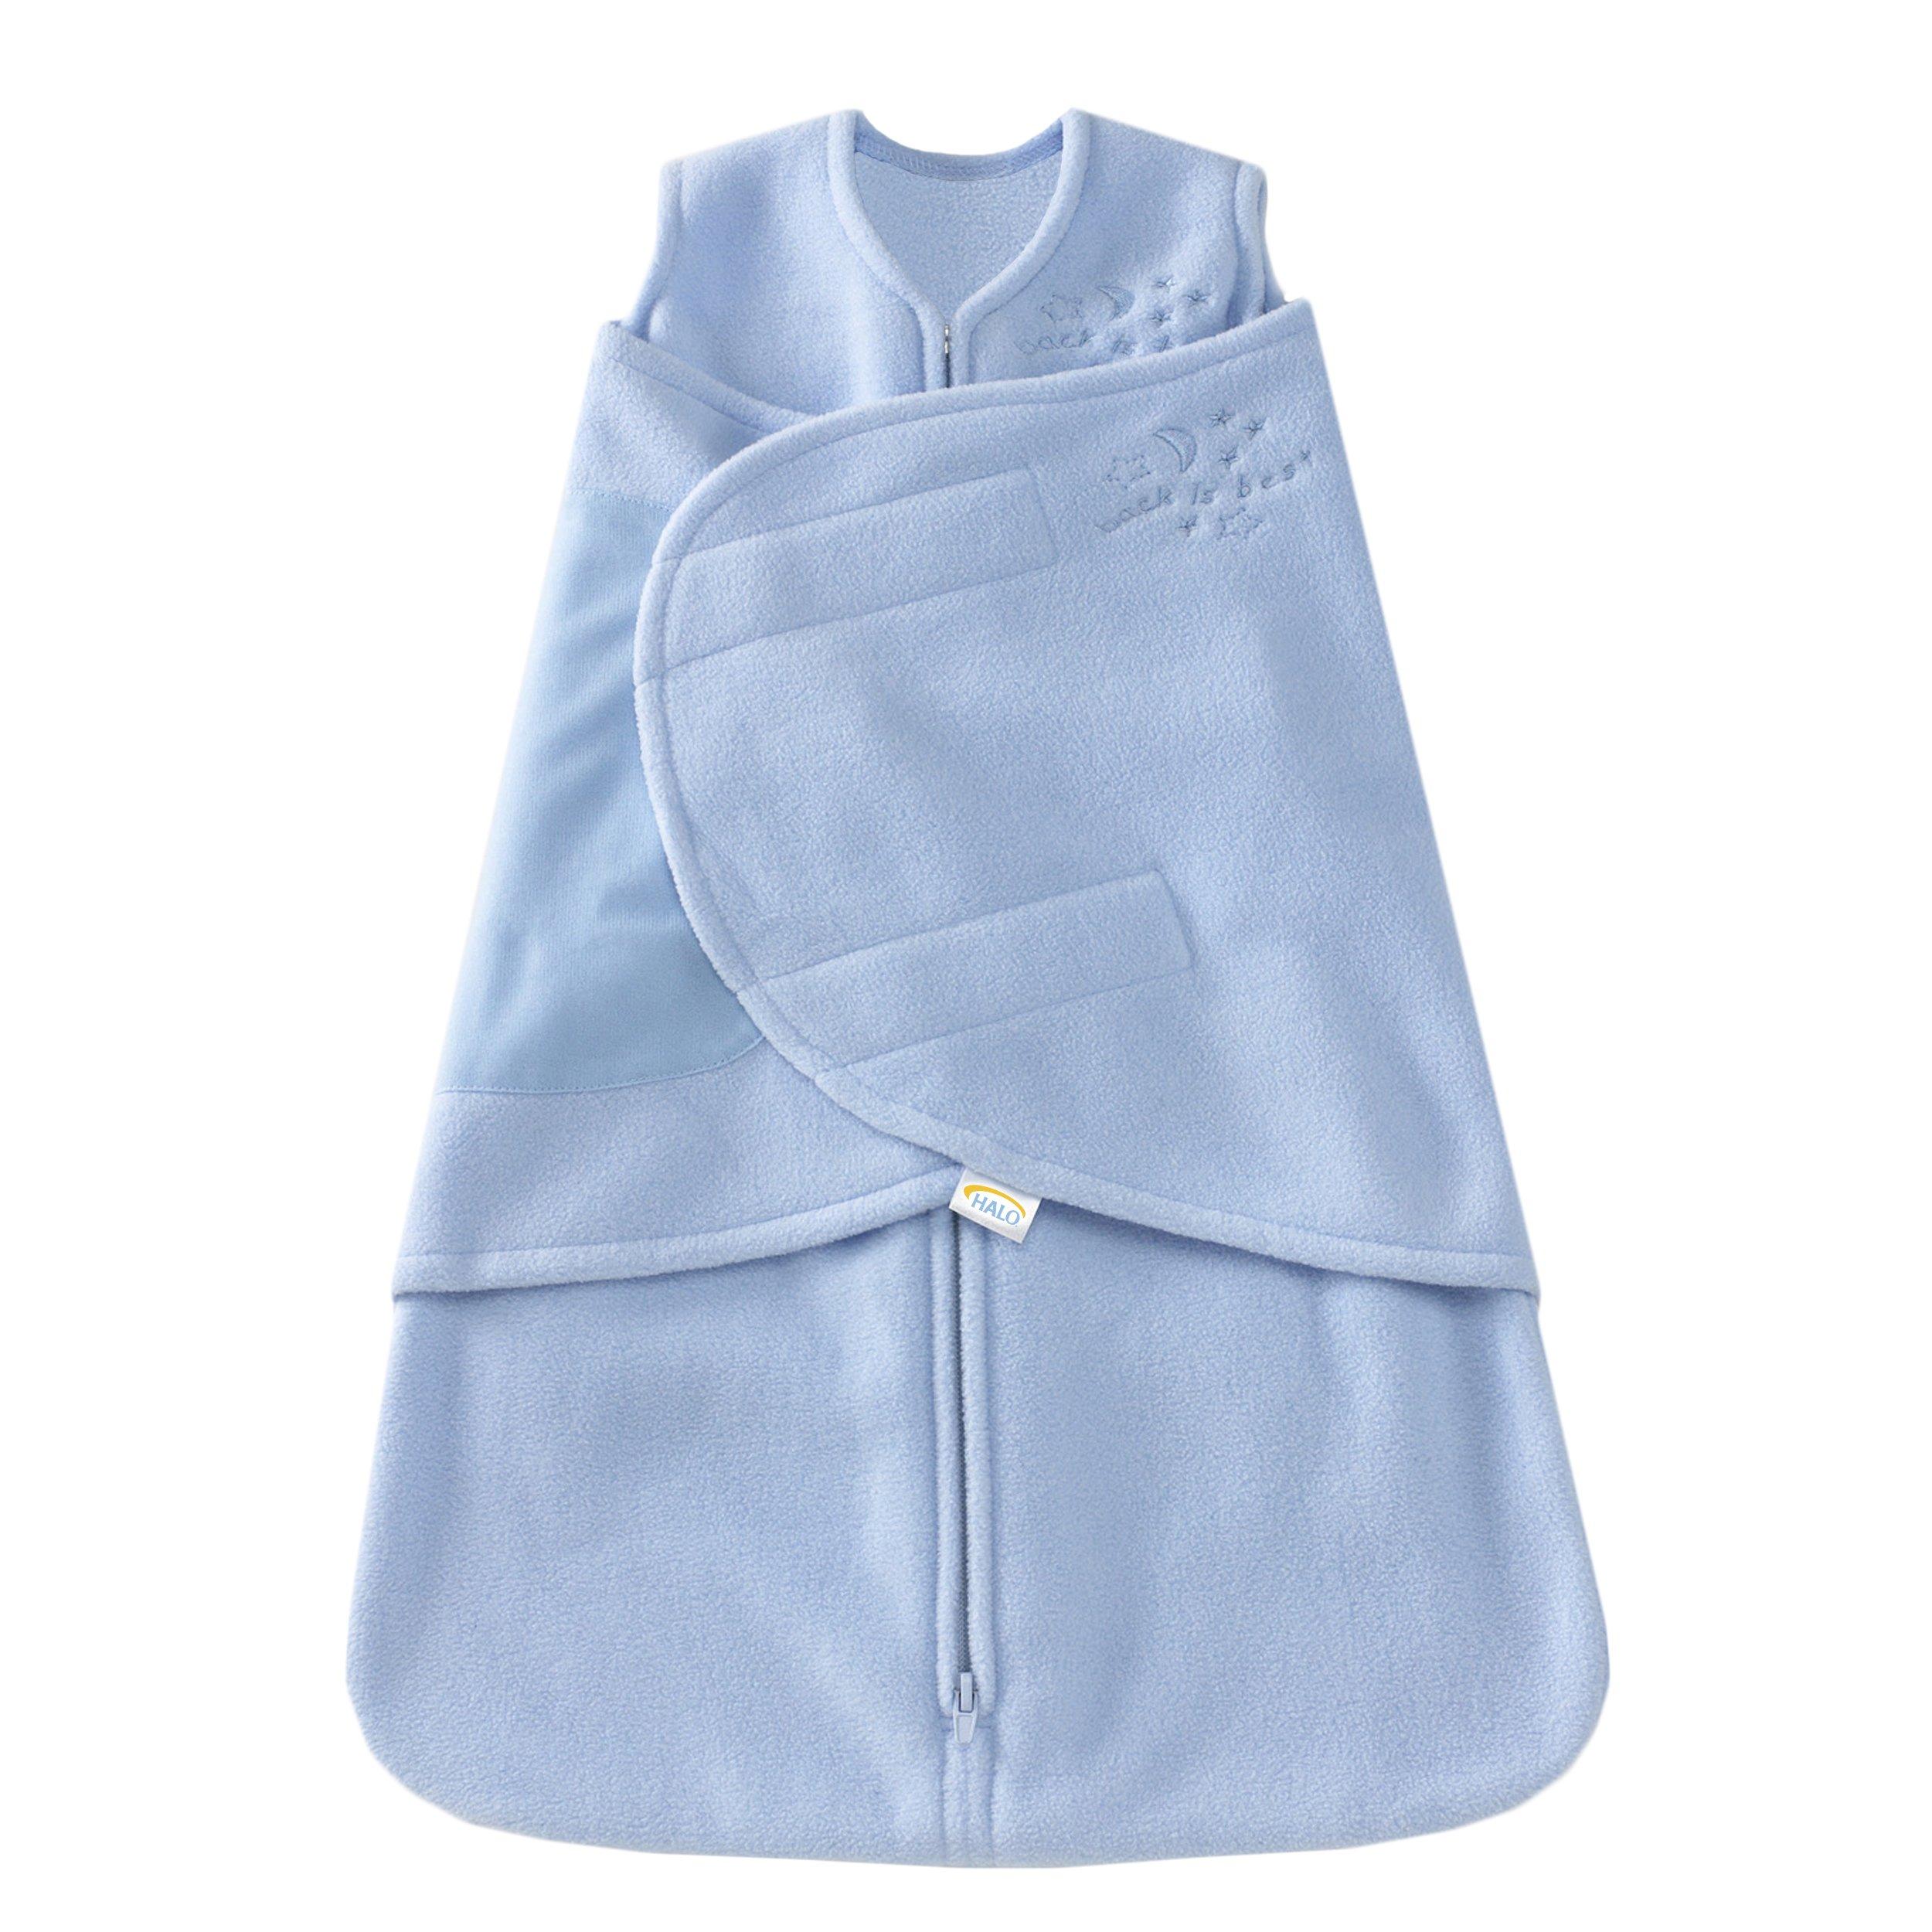 HALO SleepSack Micro-Fleece Swaddle, Baby Blue, Newborn by Halo